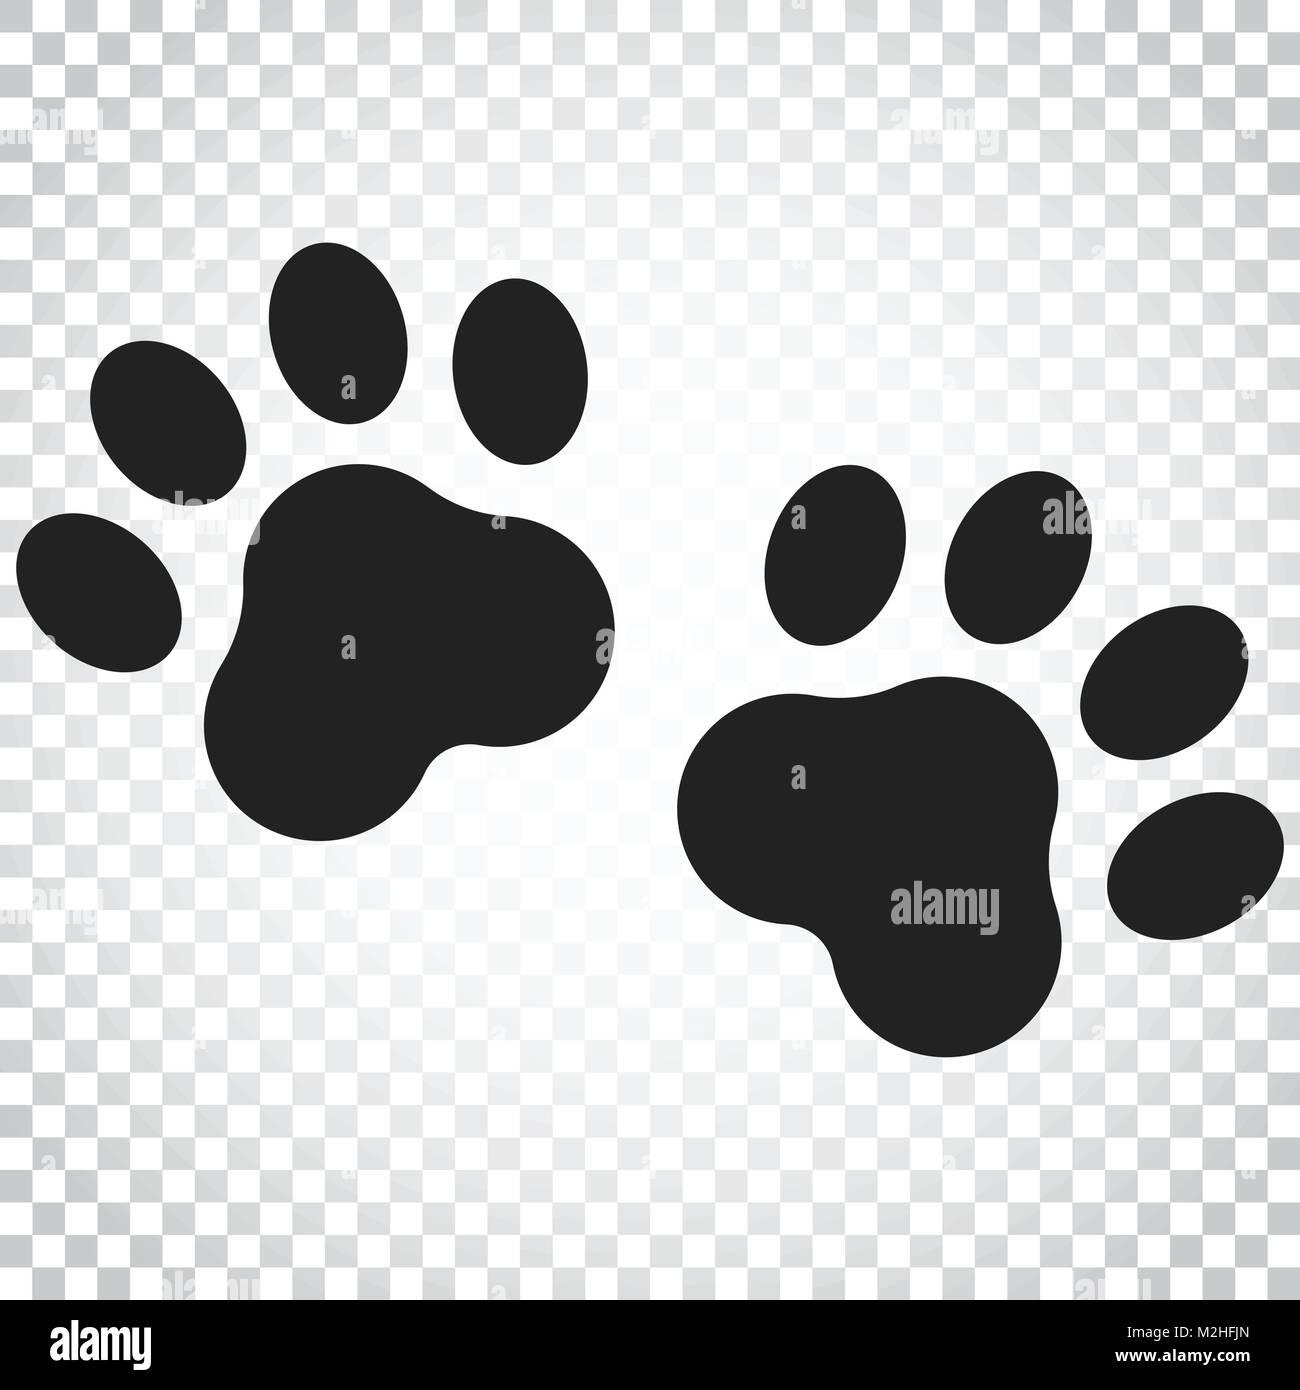 Paw Print Vector Icon Dog Or Cat Pawprint Illustration Animal Stock Vector Art Amp Illustration Vector Image 173718461 Alamy